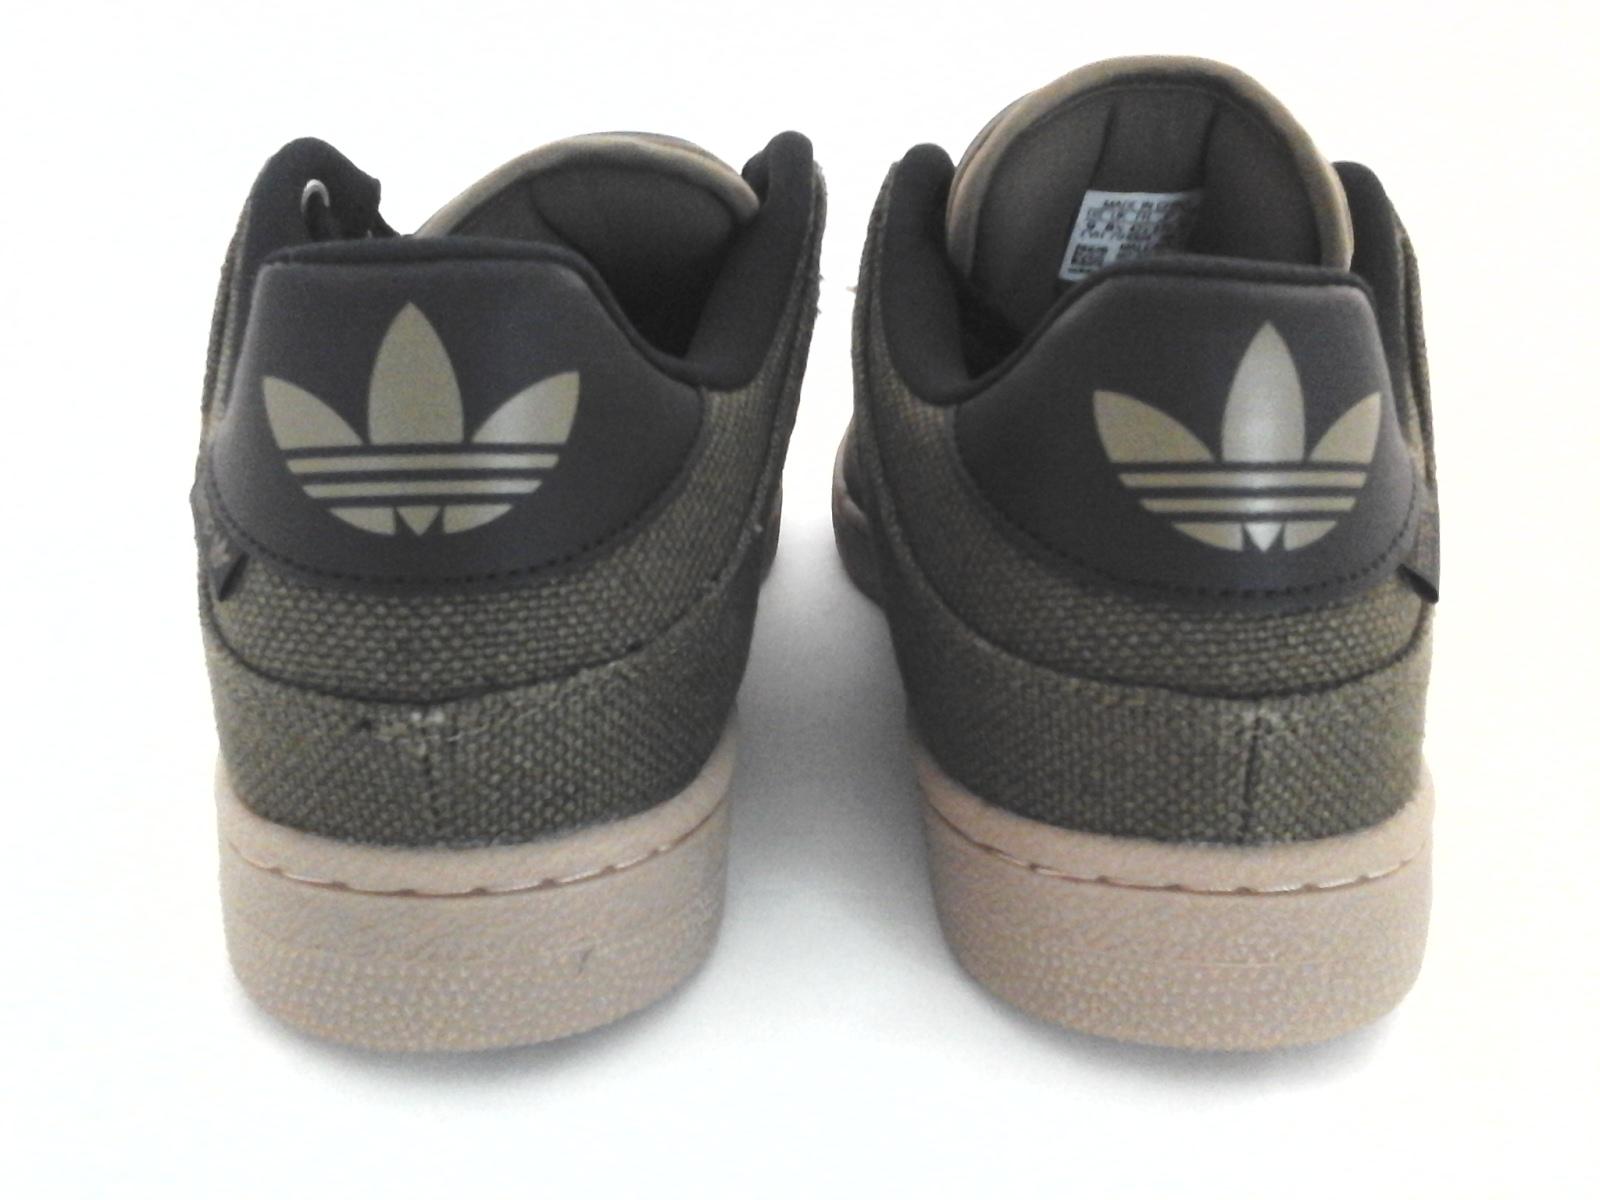 3d53fd5f8c4 Adidas Bucktown ST HEMP Olive Green Black w Gum Soles Sneakers Shoes AC6980